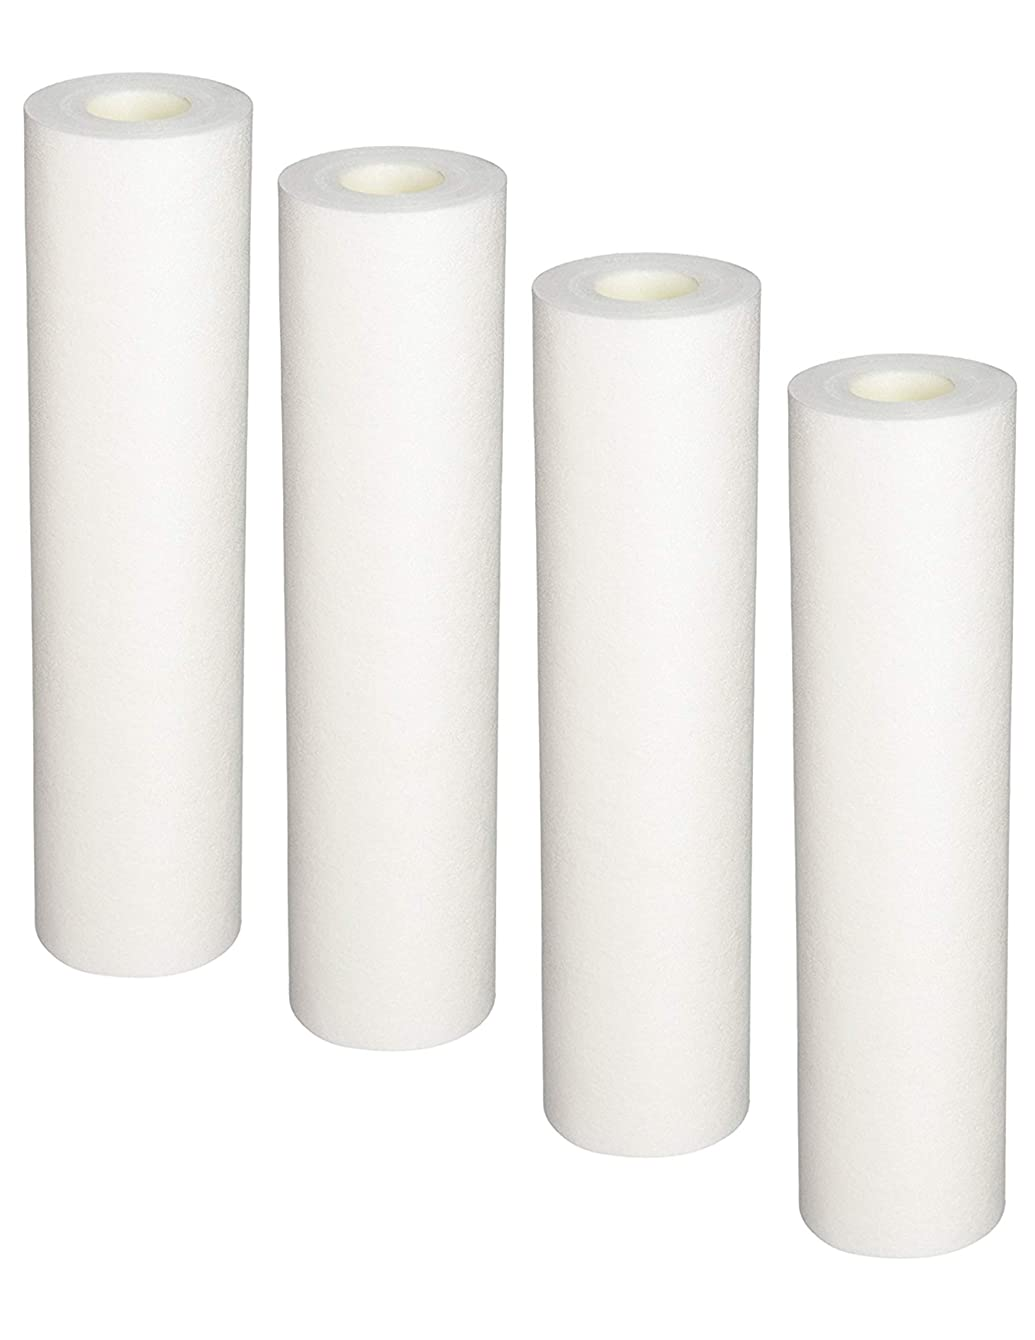 HDX HDX2BF4 Melt-Blown Household Filter (4-Pack) by CFS